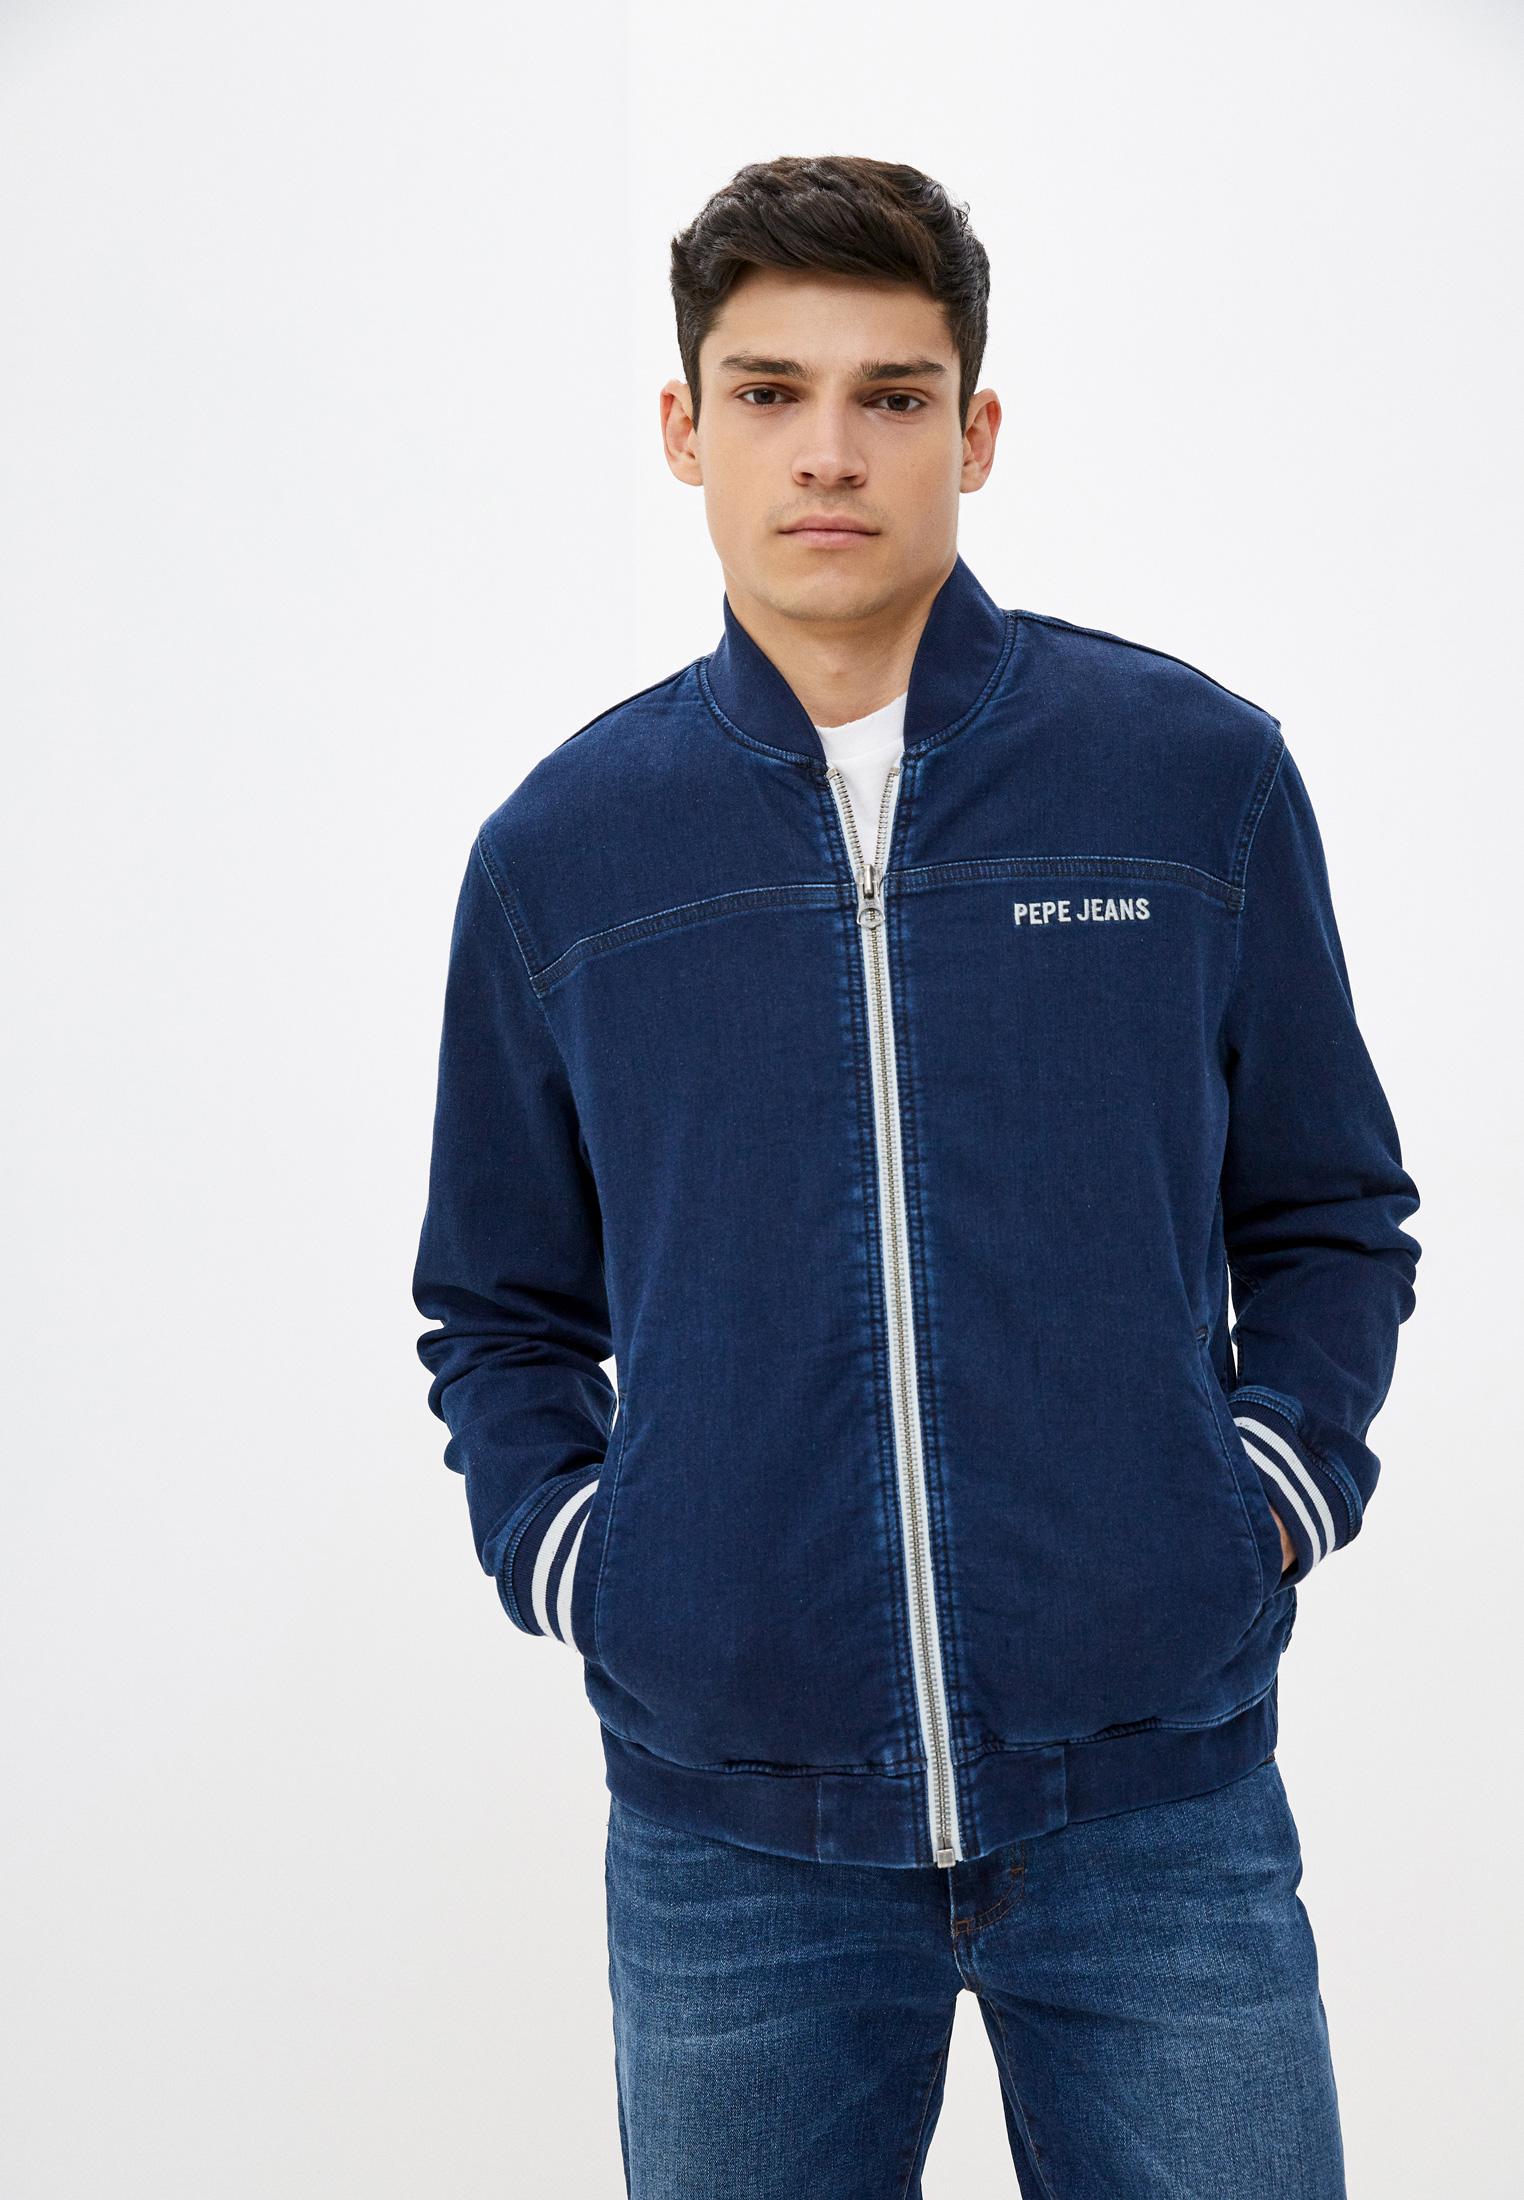 Джинсовая куртка Pepe Jeans (Пепе Джинс) PM402399